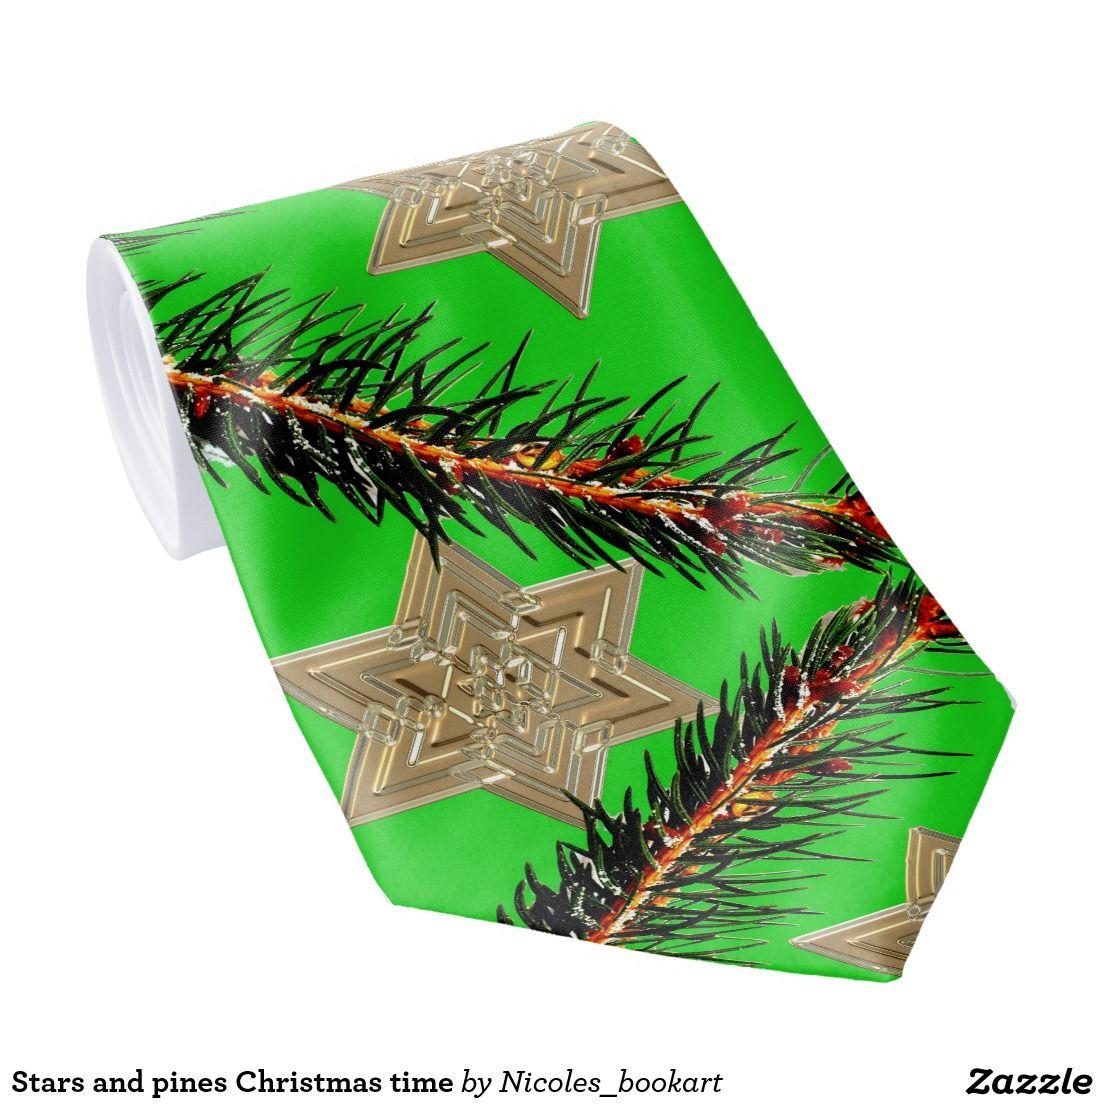 Stars and pines Christmas time